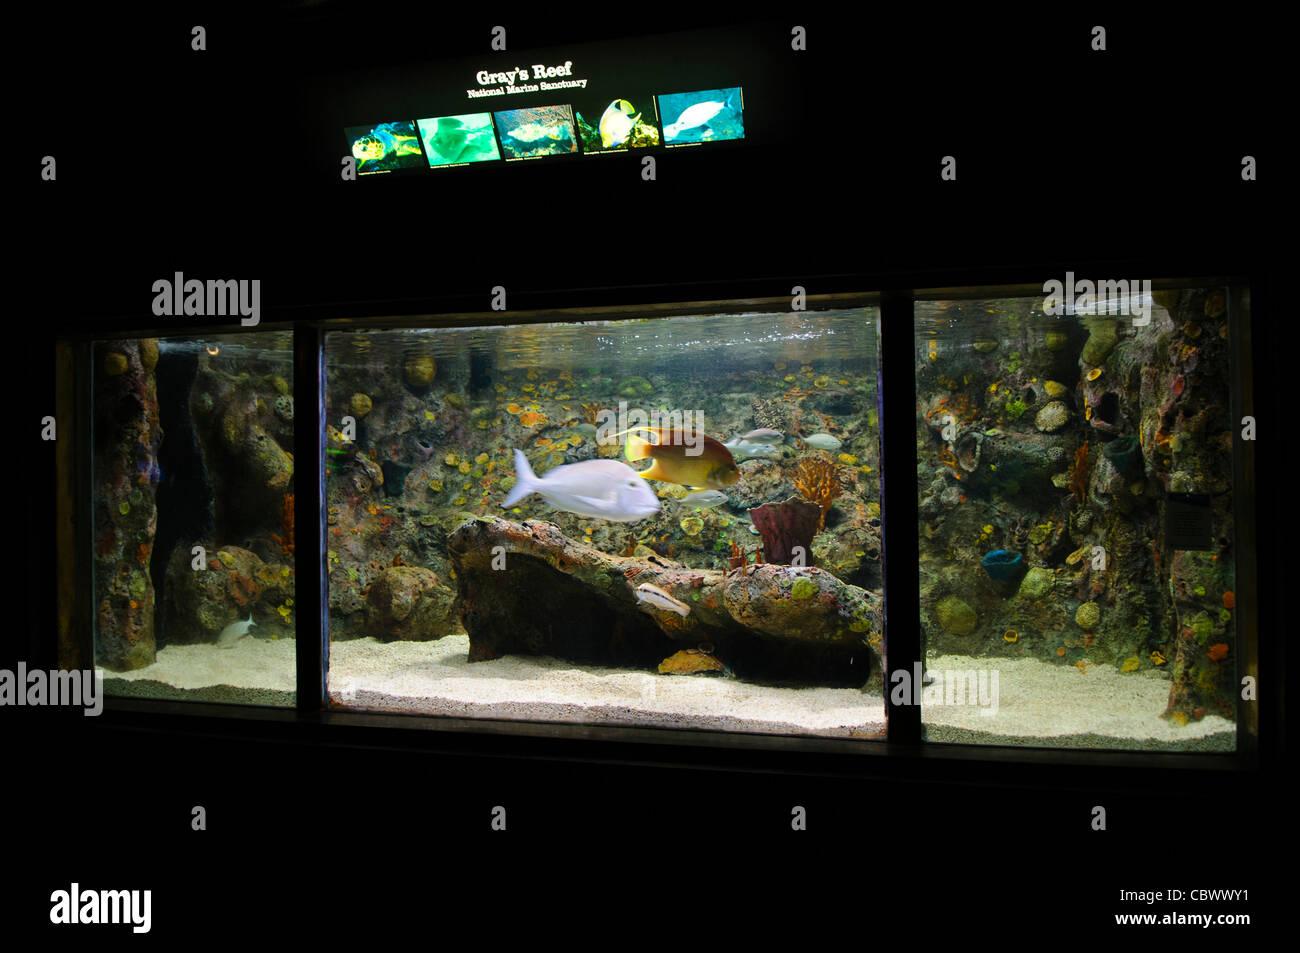 An exhibit of Gray's Reef National Marine Sanctuary. The exhibit is part of Washington DC's National Aquarium. - Stock Image